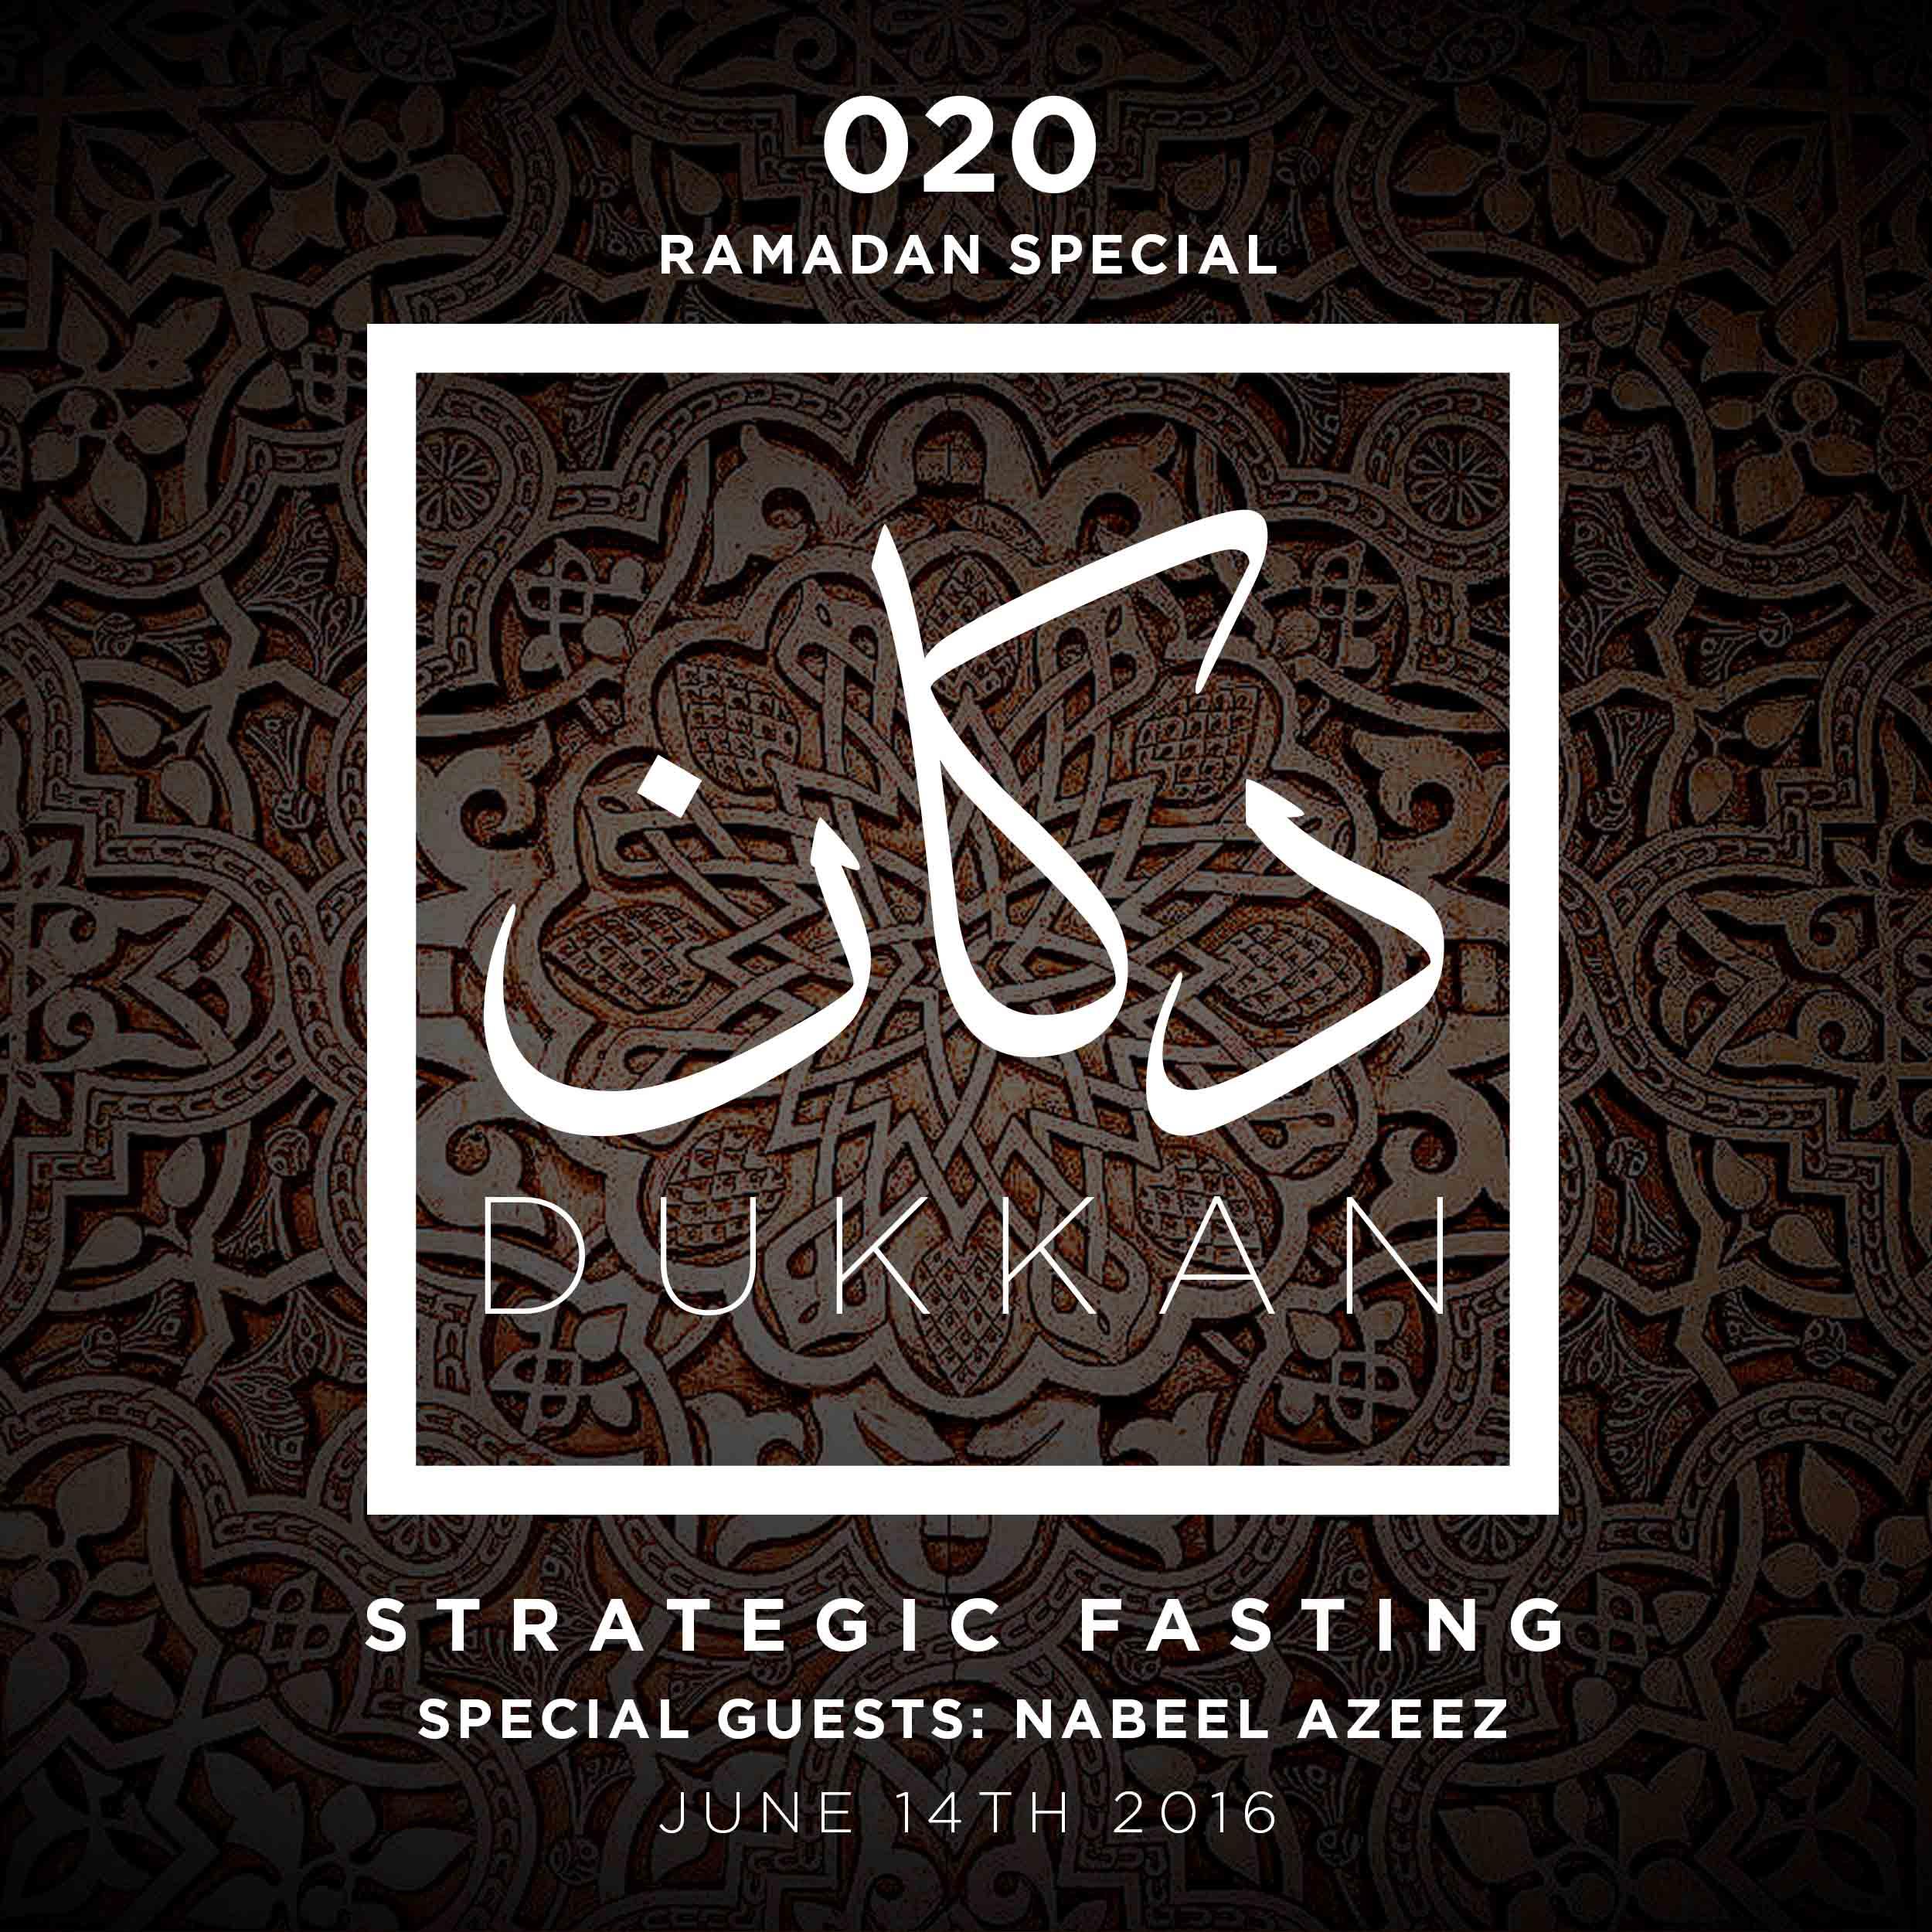 strategic fasting